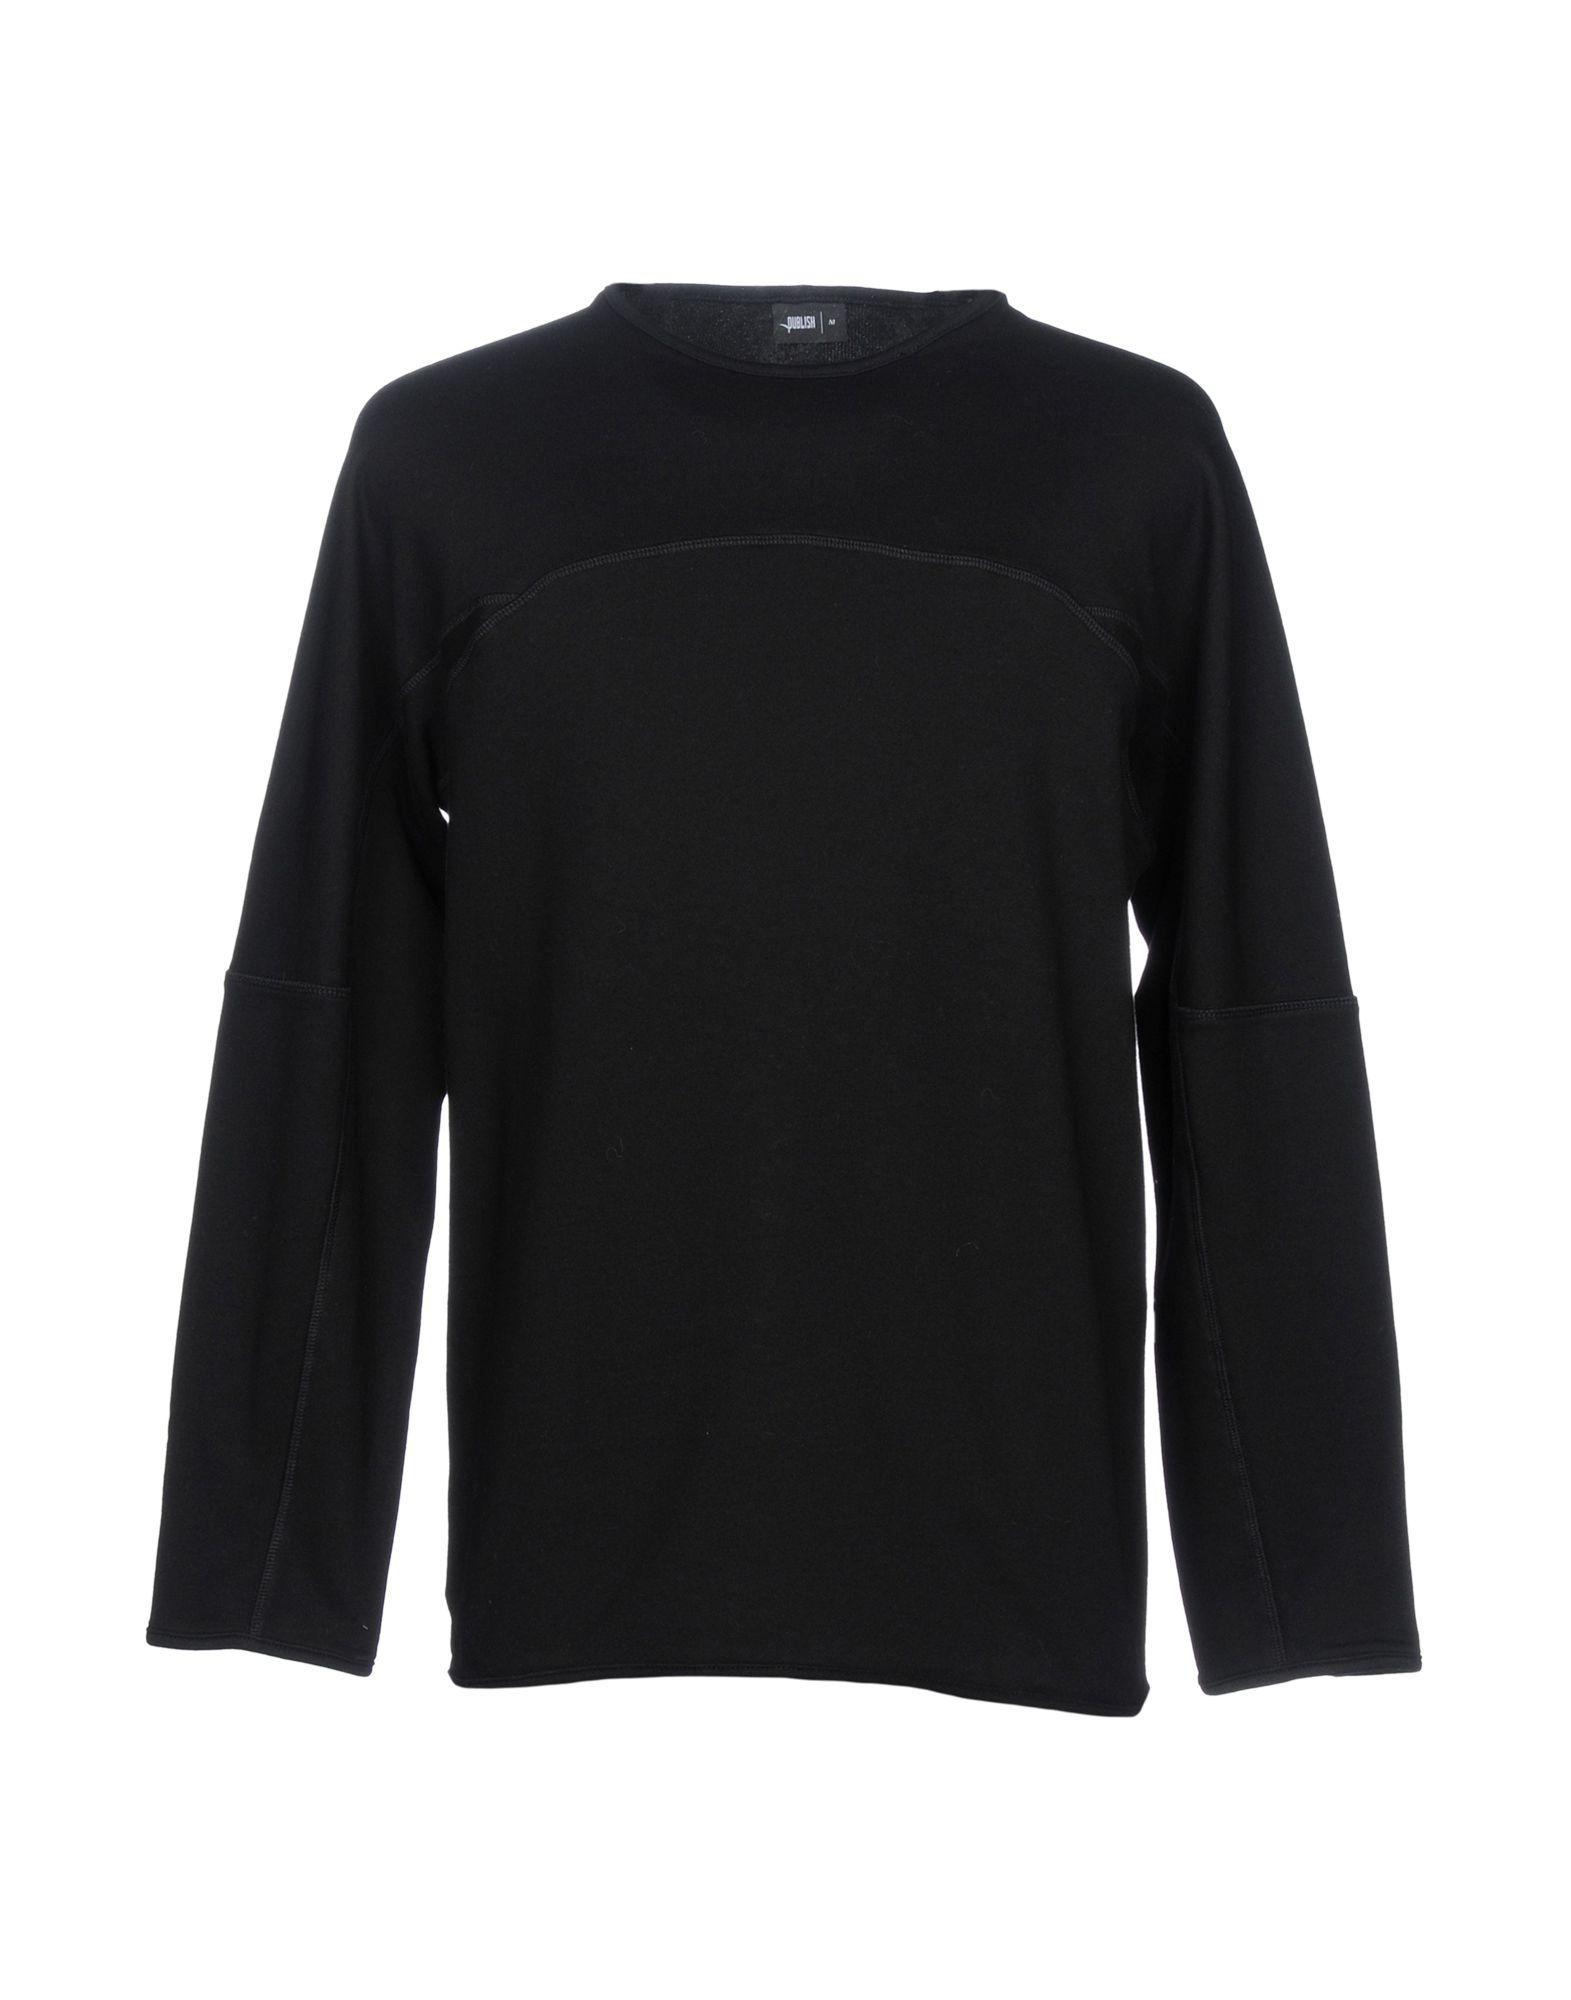 PUBLISH Sweatshirt in Black